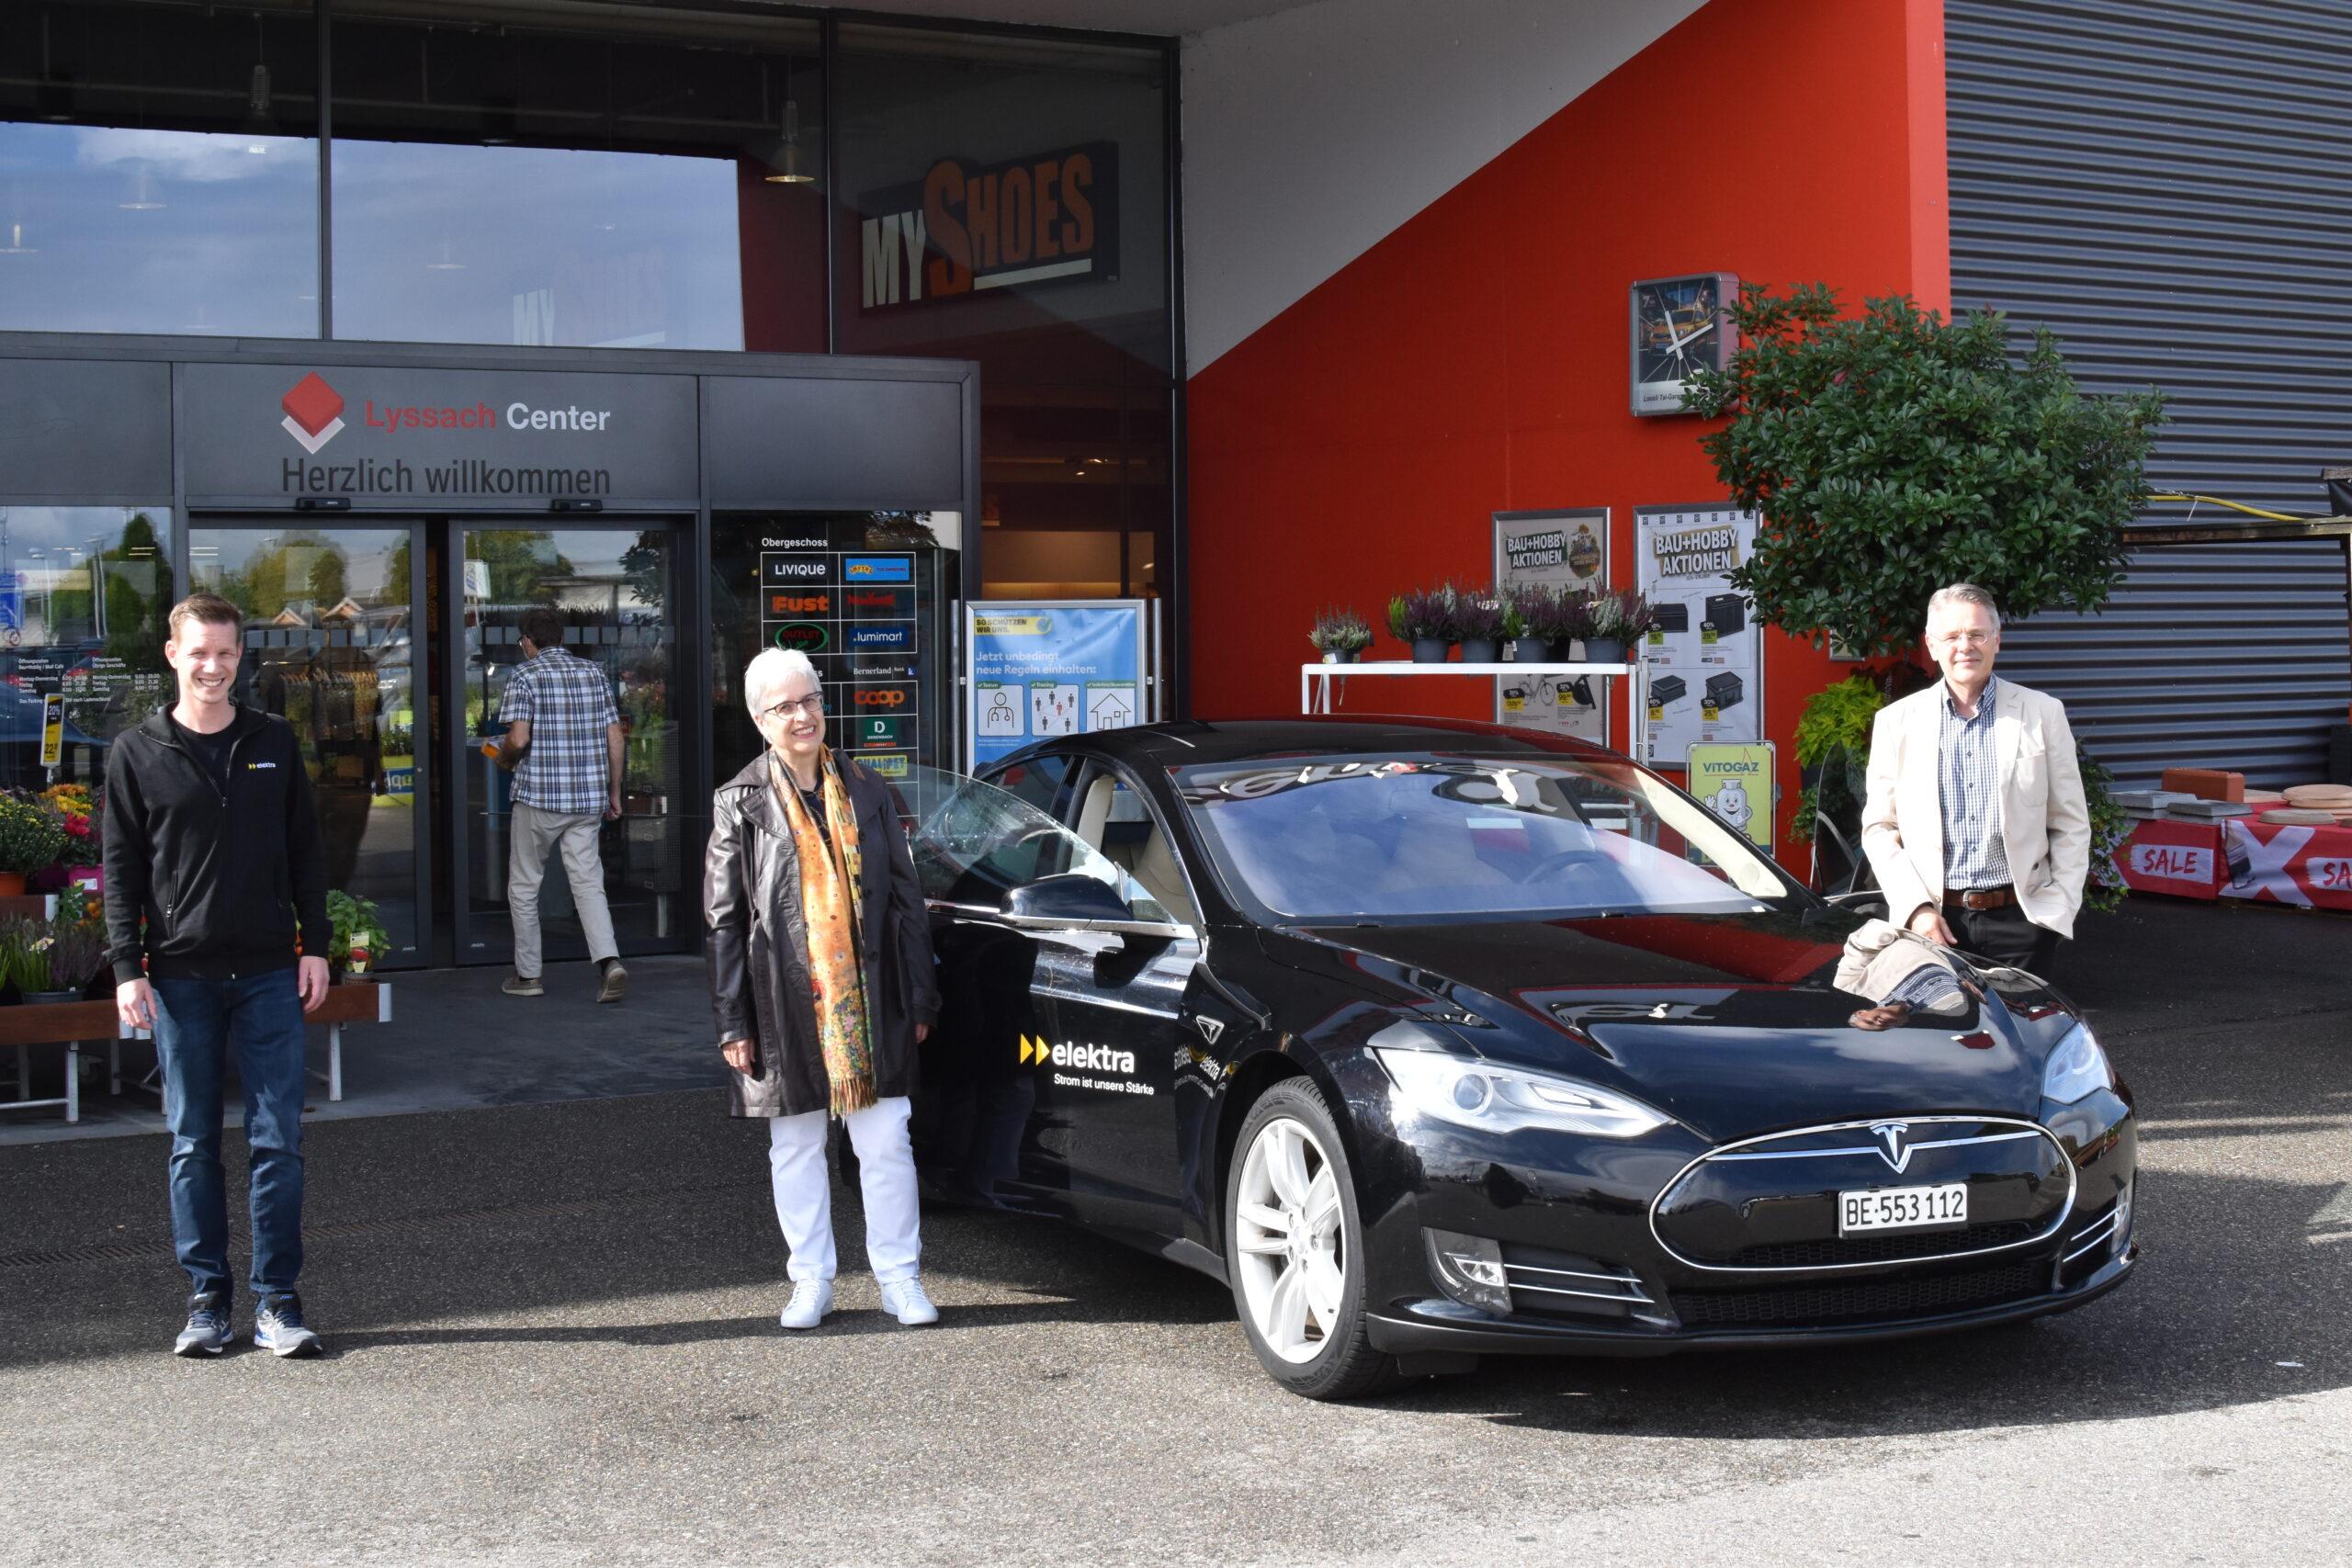 Wettbewerbsgewinnerin Frau Schori hat an der Mobility Week 2020 den ersten Preis gewonnen.